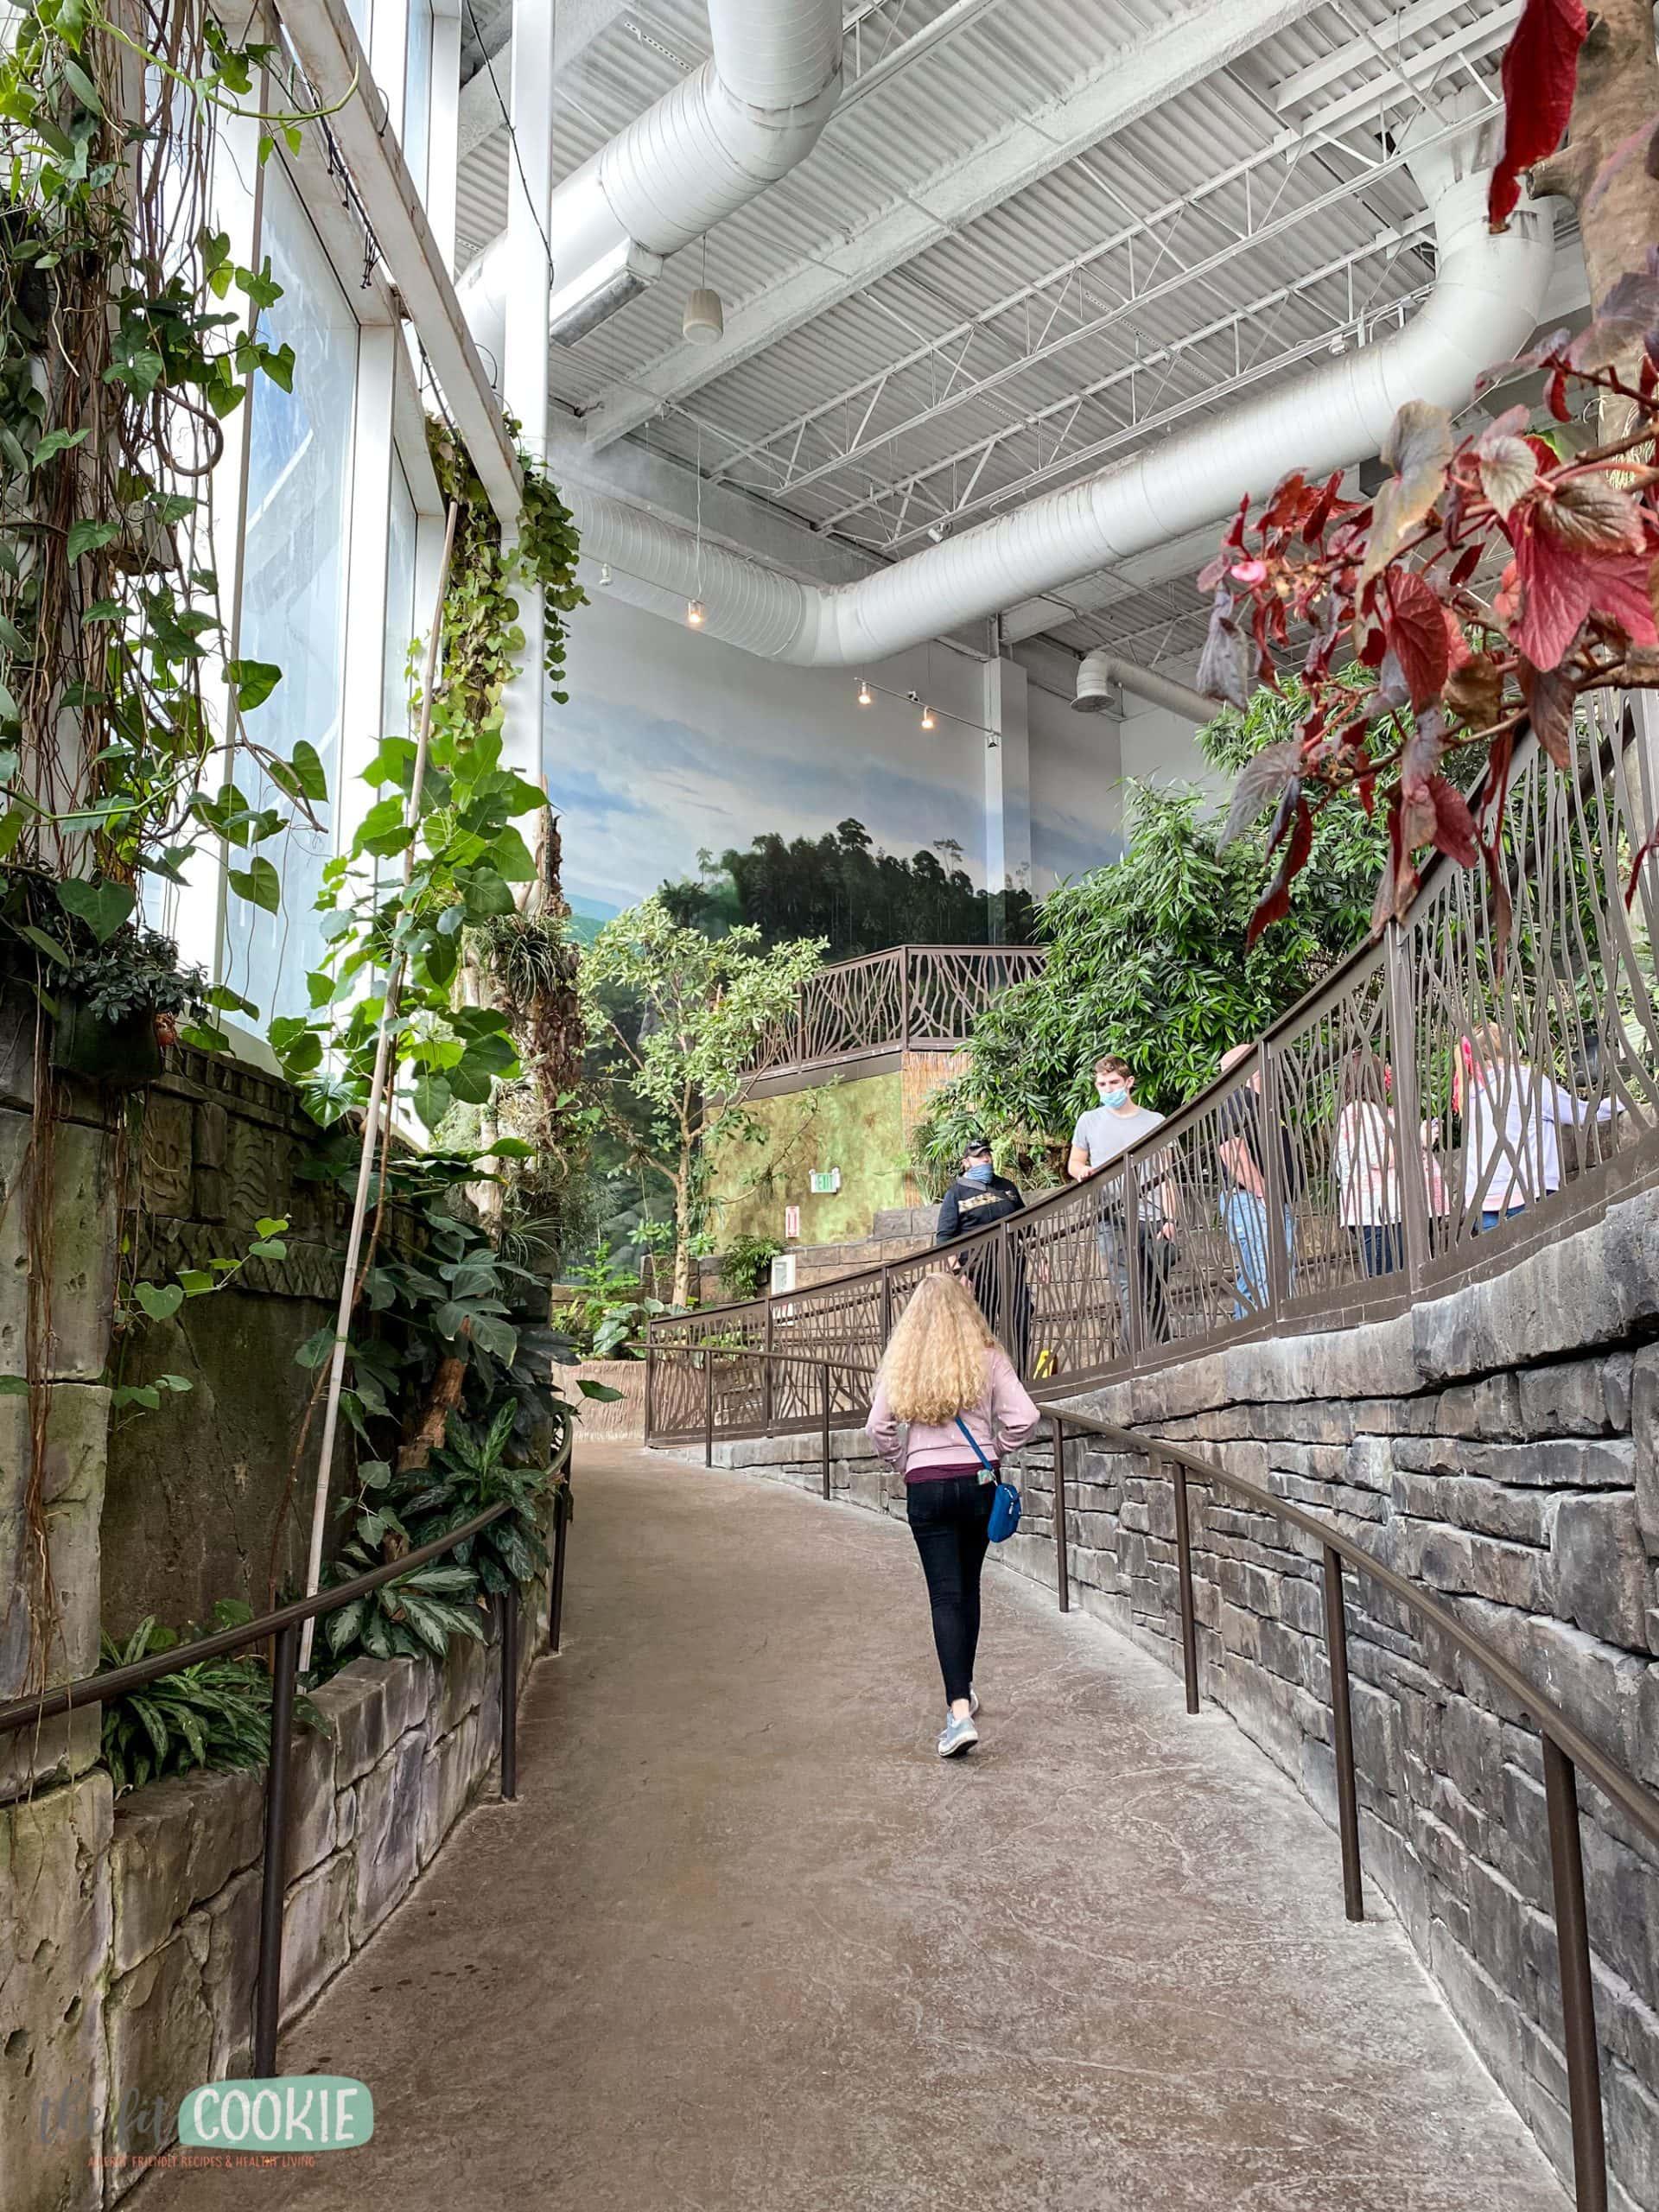 Journey to South America at Living Planet Aquarium